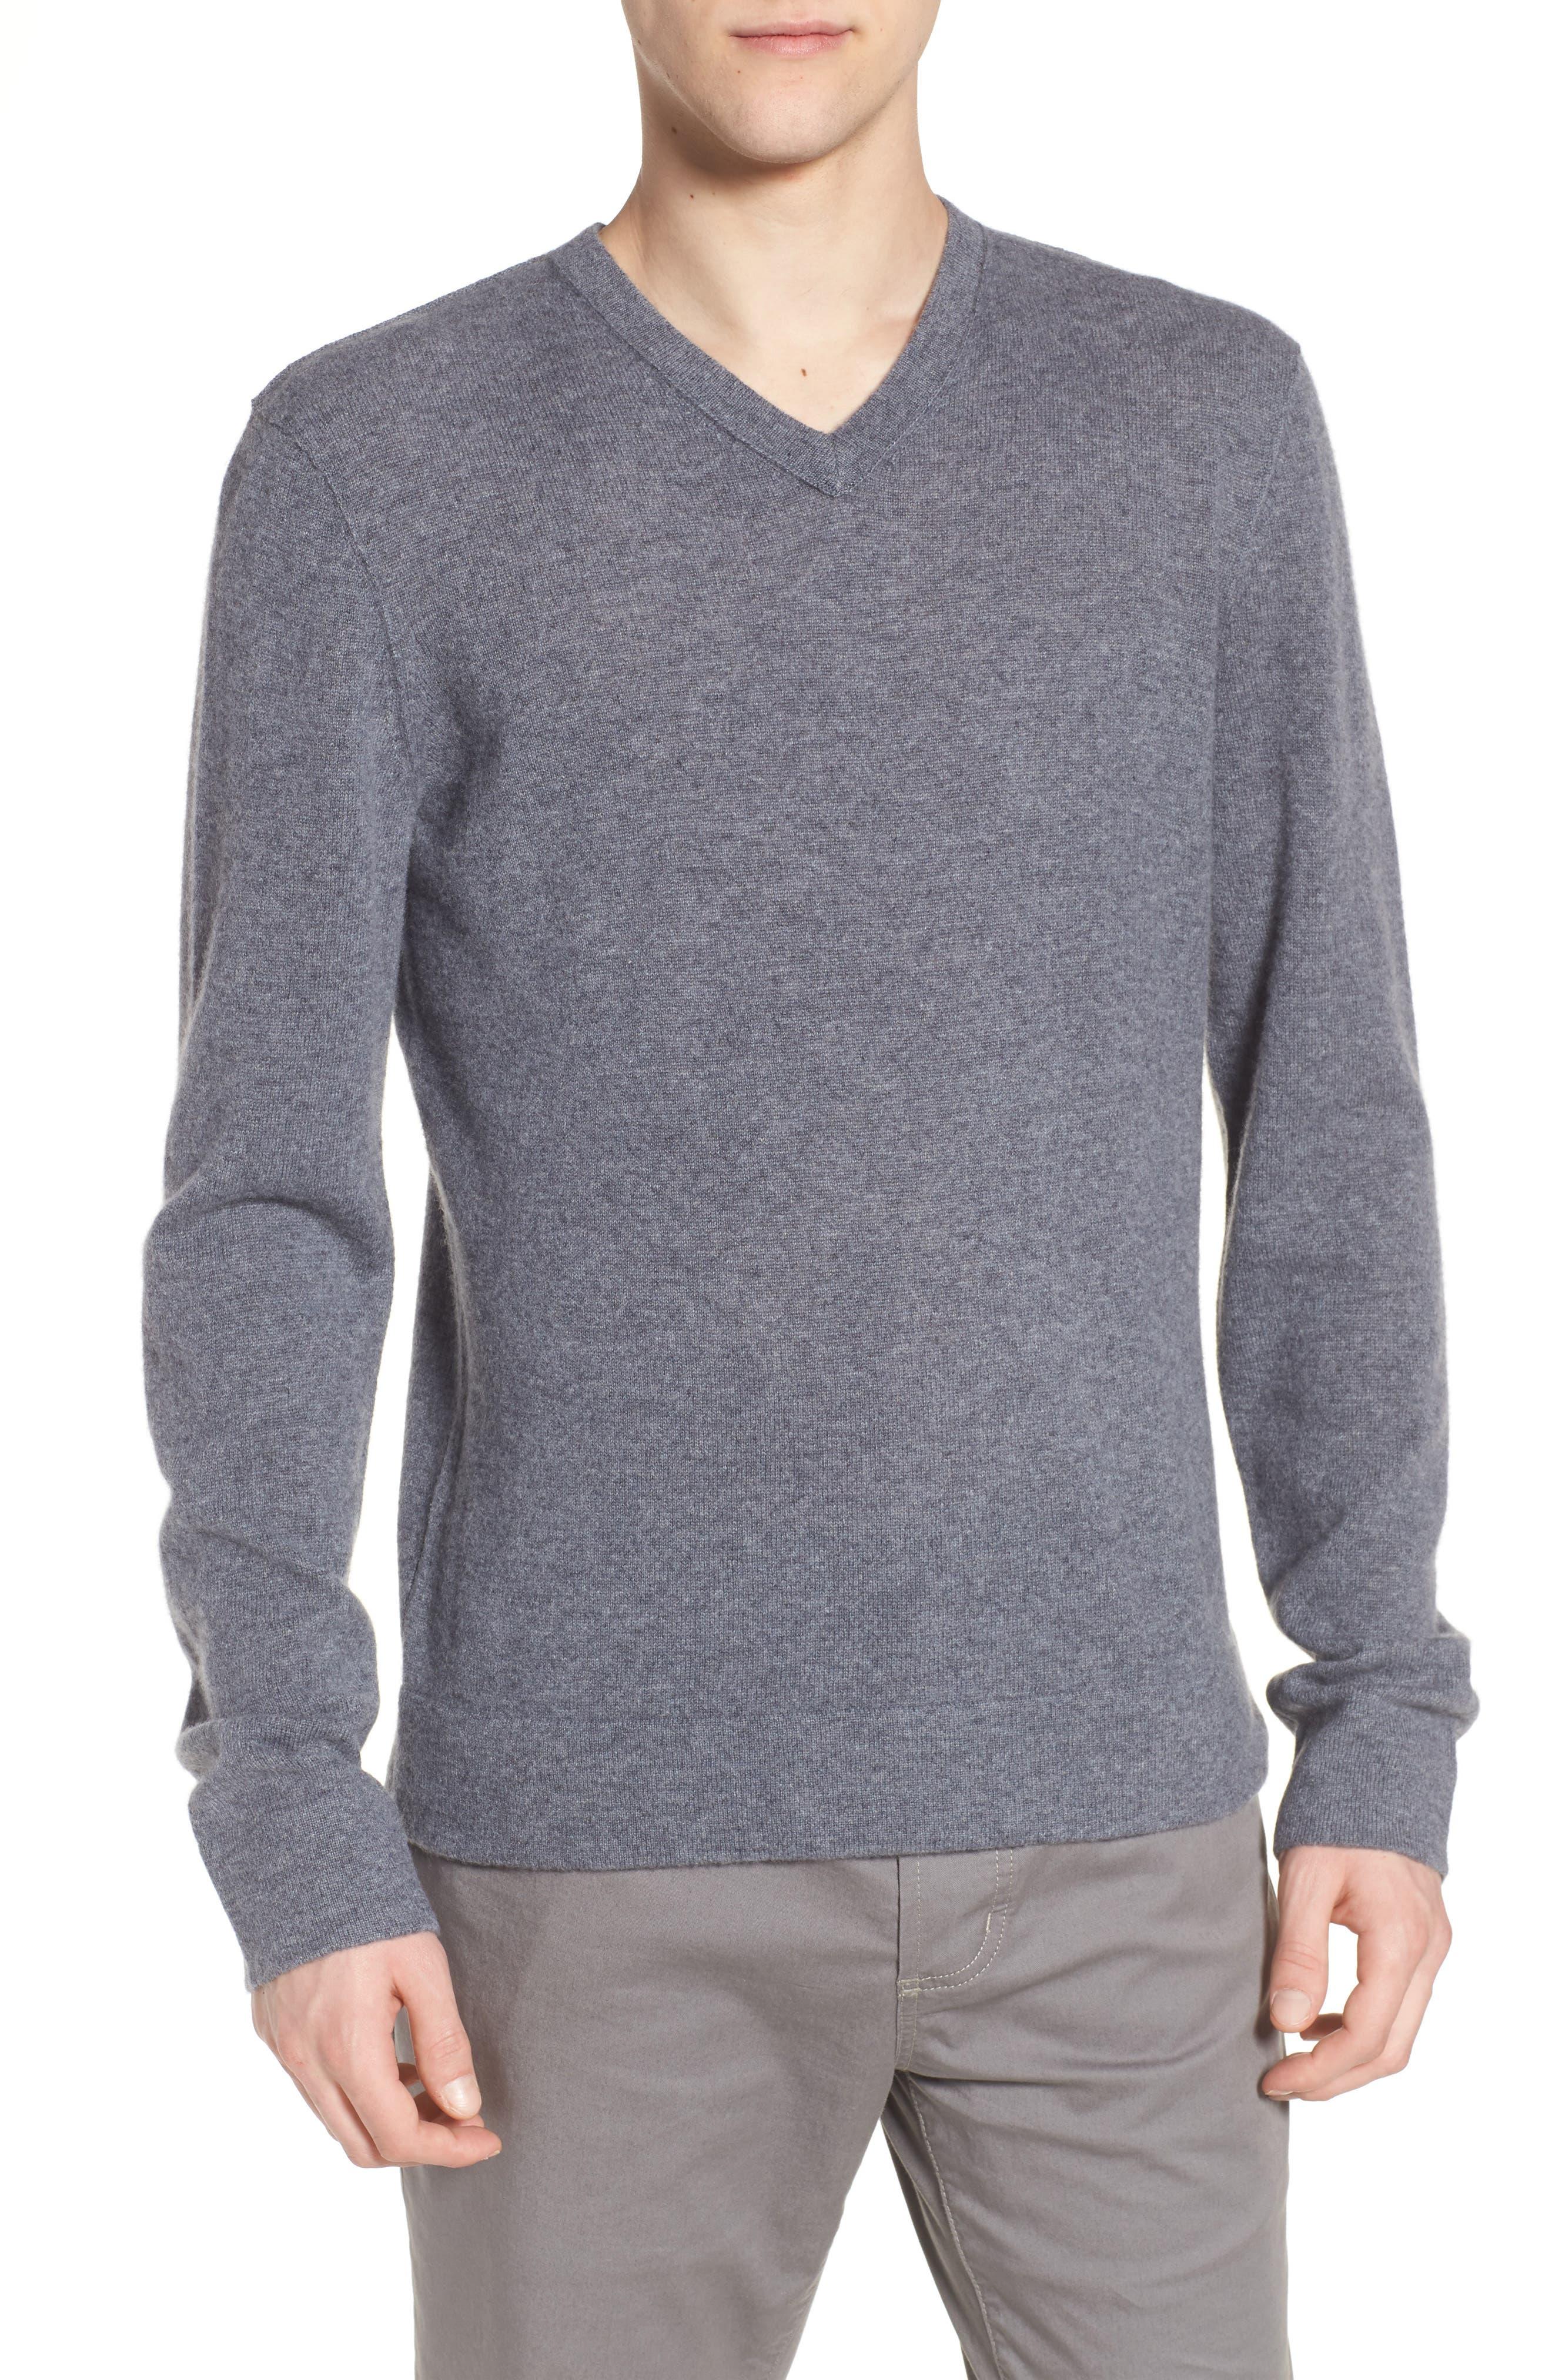 Alternate Image 1 Selected - James Perse Cashmere V-Neck Sweater